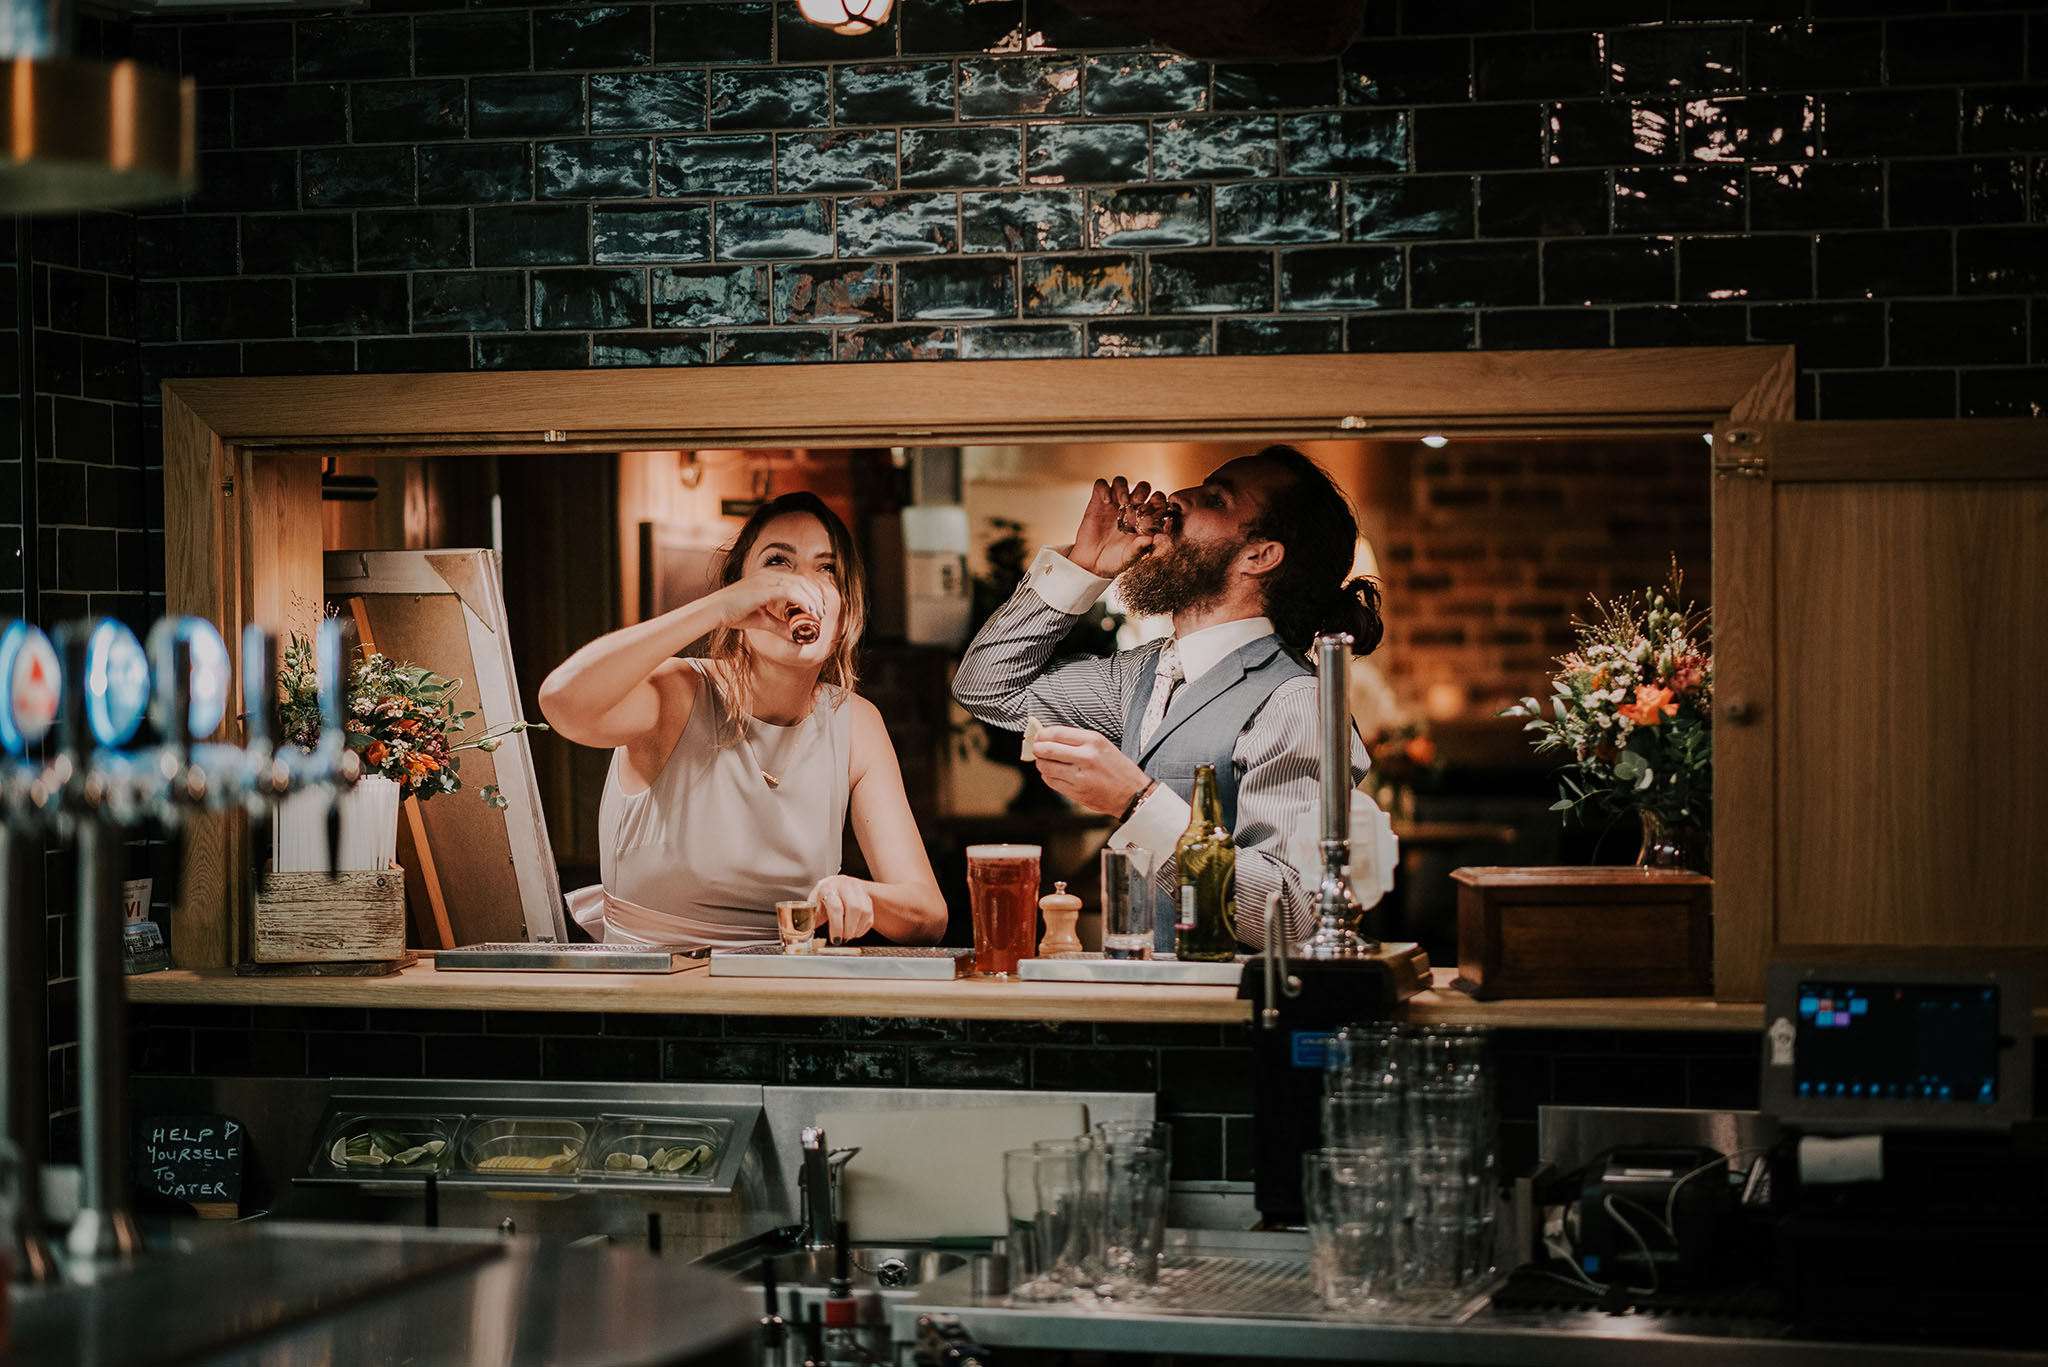 scott-stockwell-photography-wedding-60.jpg